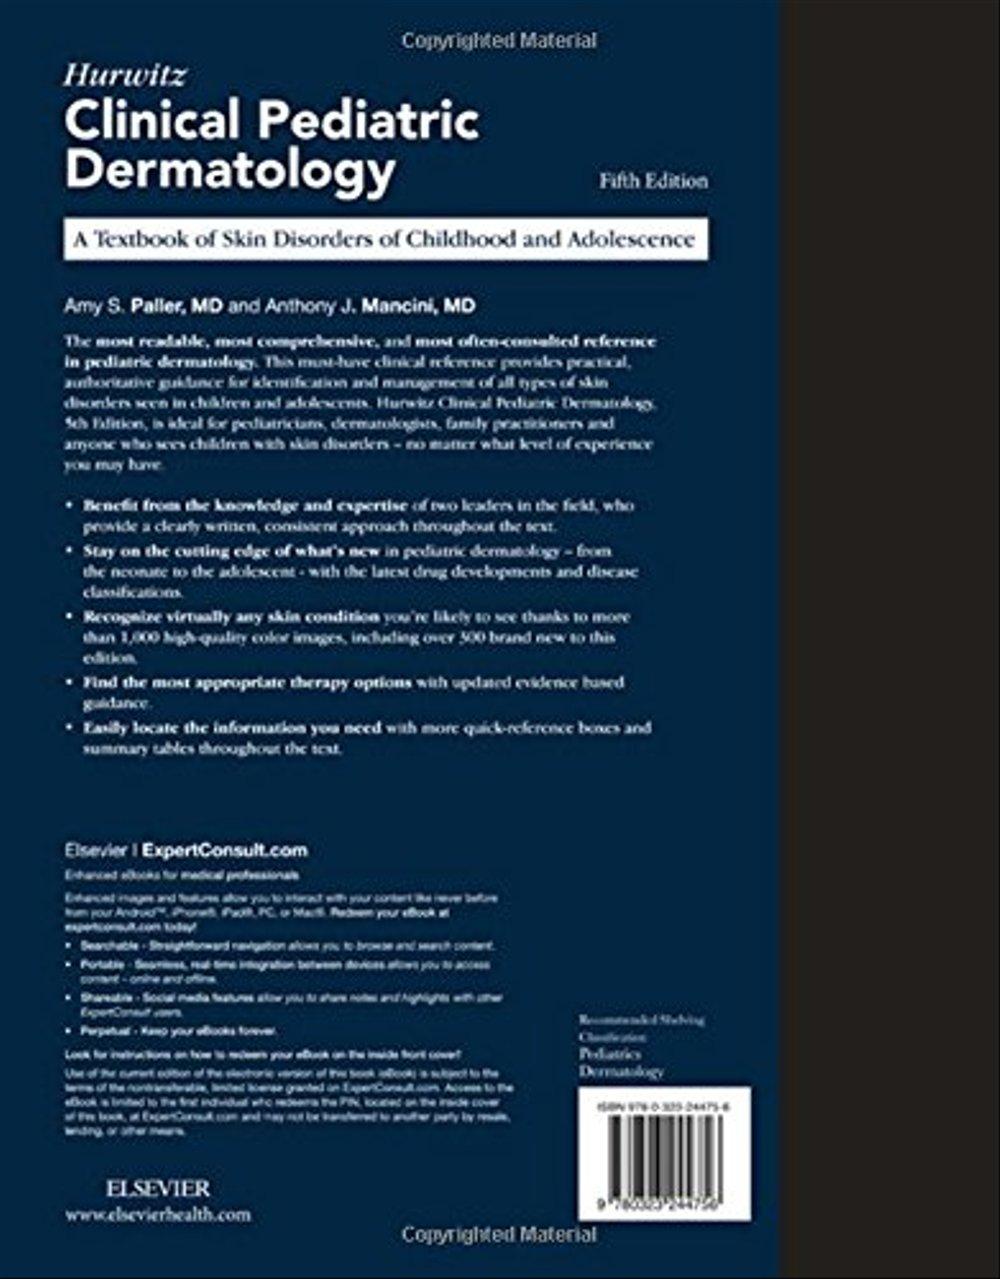 hurwitz clinical pediatric dermatology 5th edition pdf